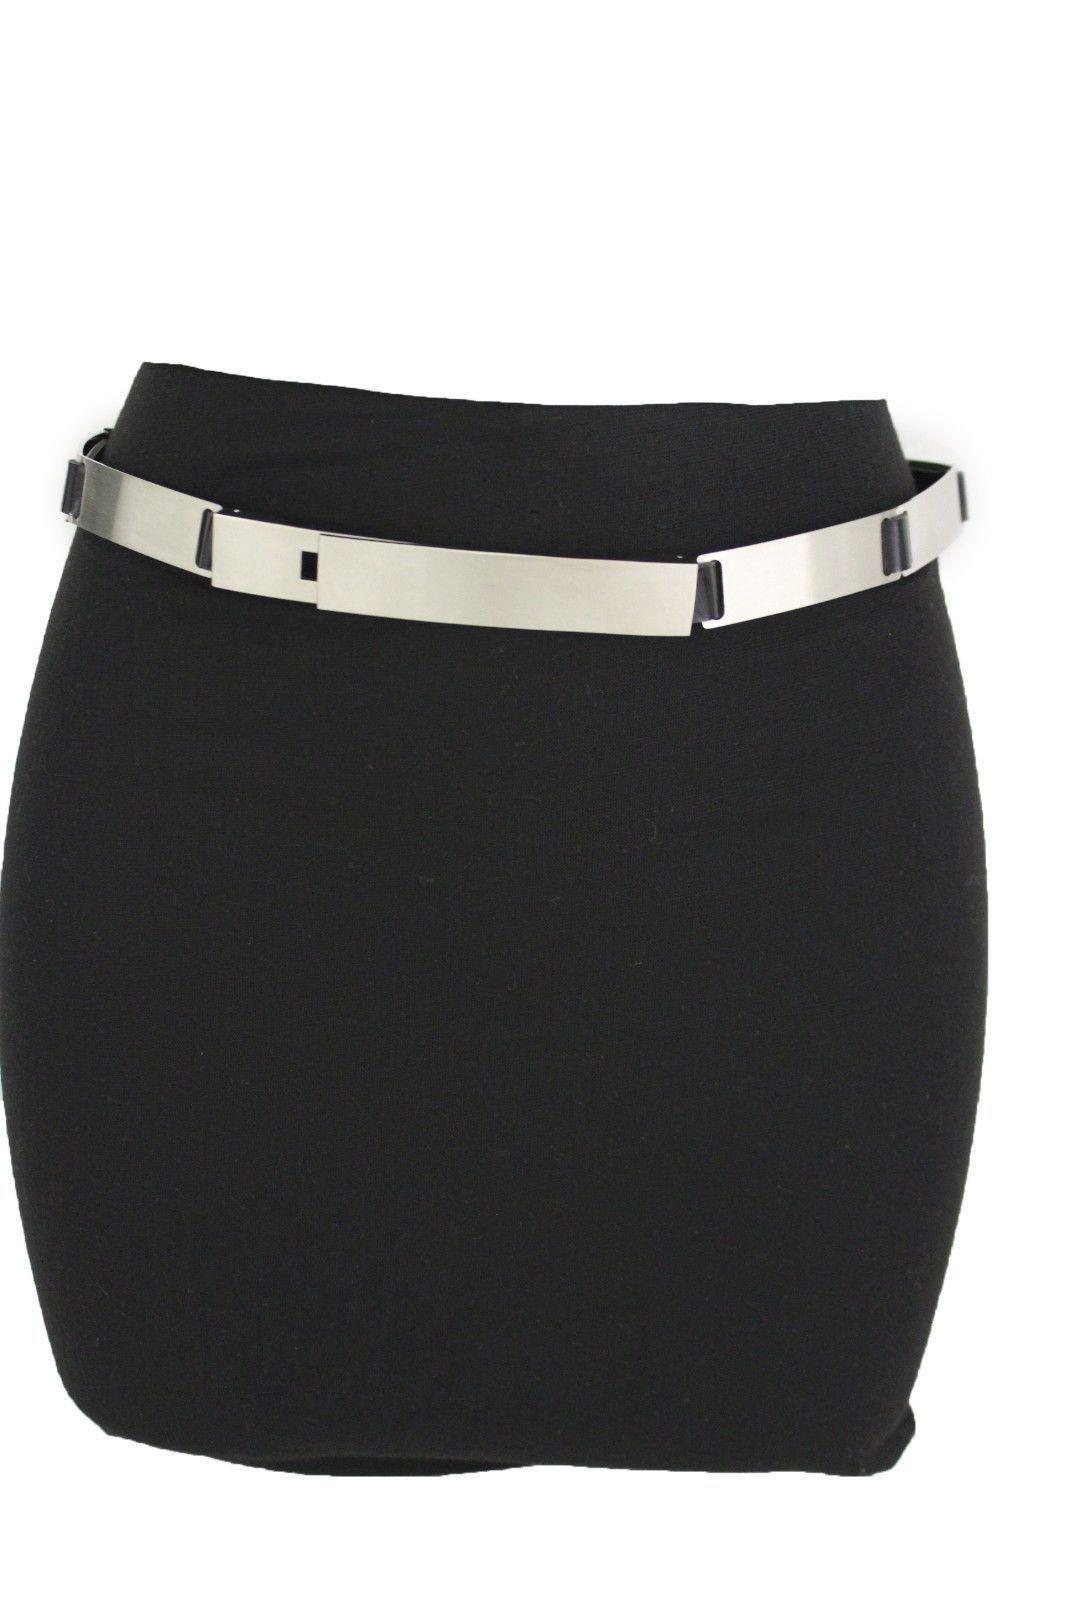 Women Black Fashion Stretch Hip High Waist Belt Silver Metal Plate Buckle S M